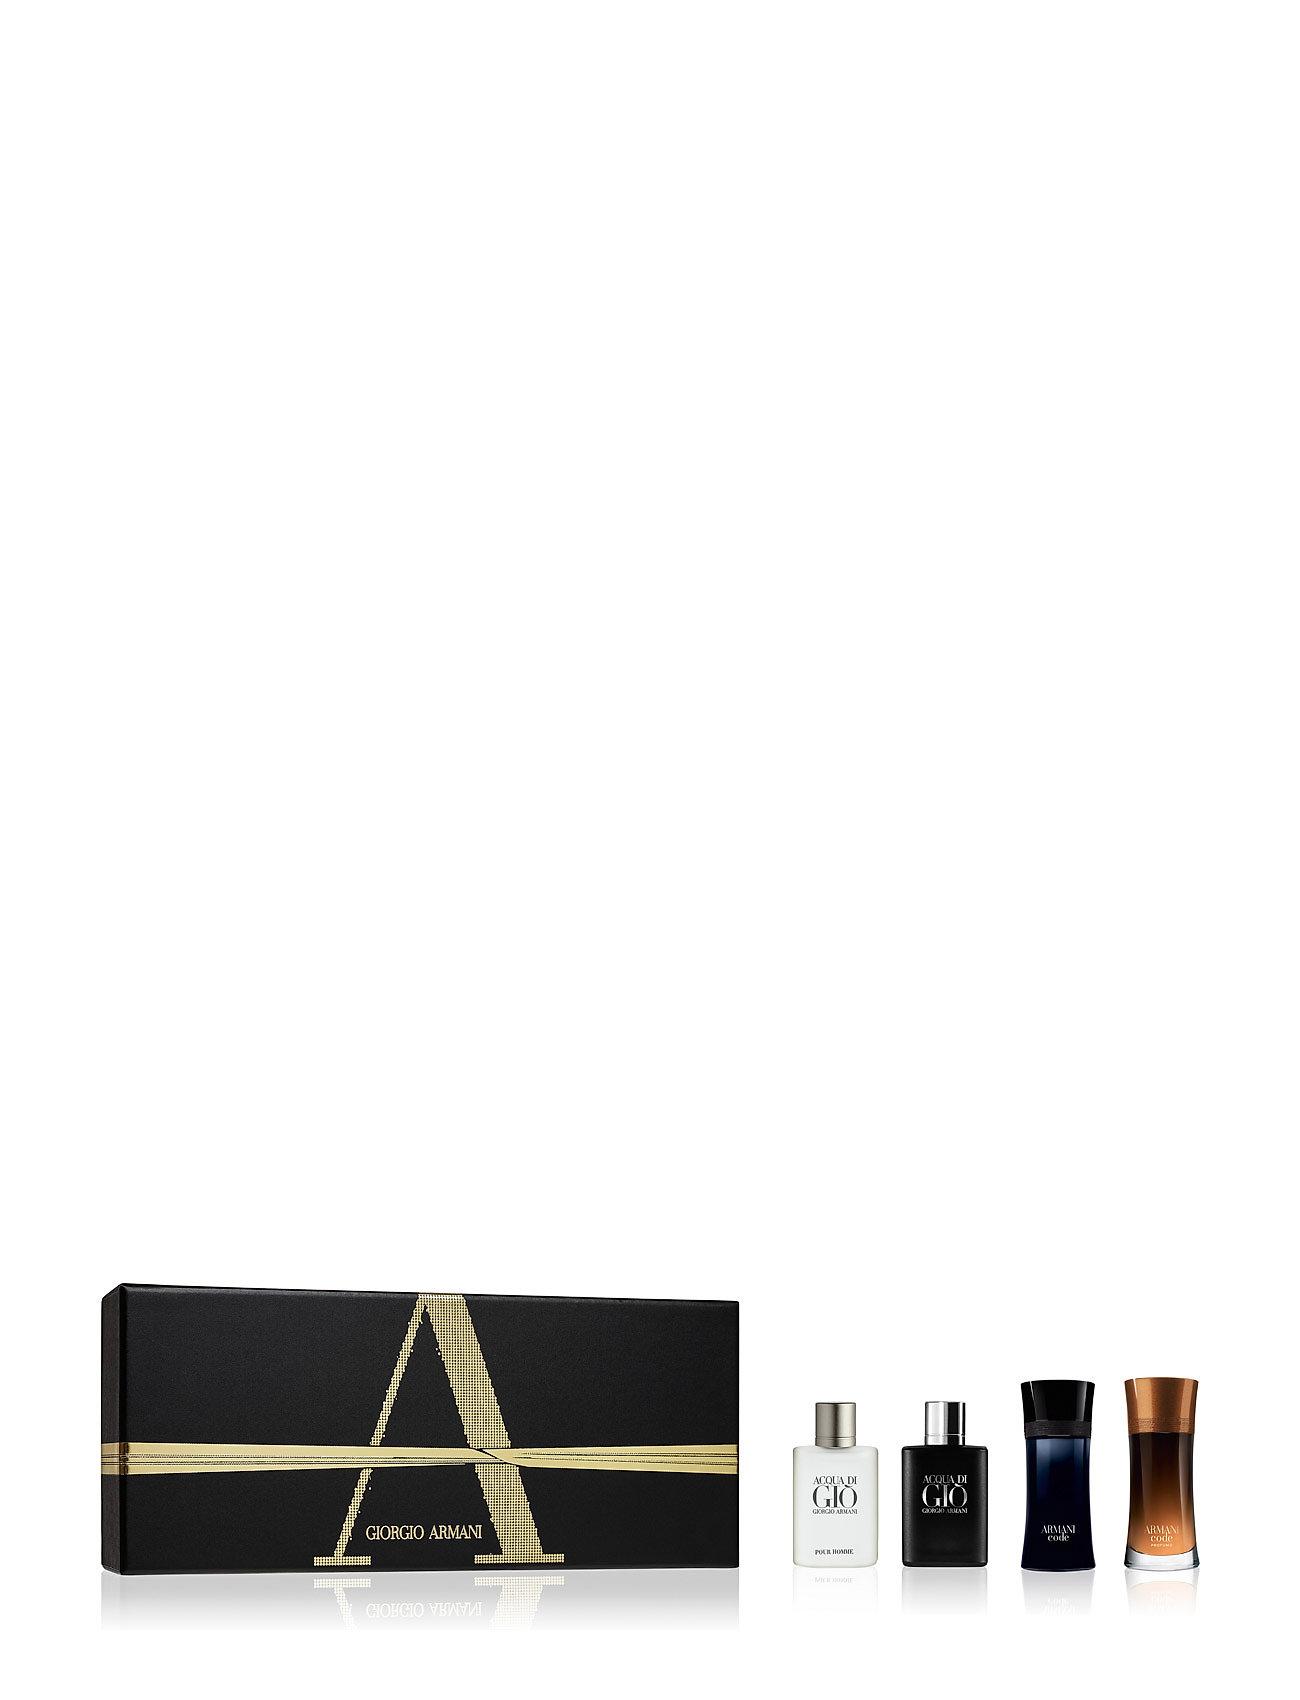 Giorgio Armani Giorgio Armani Men Miniatures Gift box - CLEAR